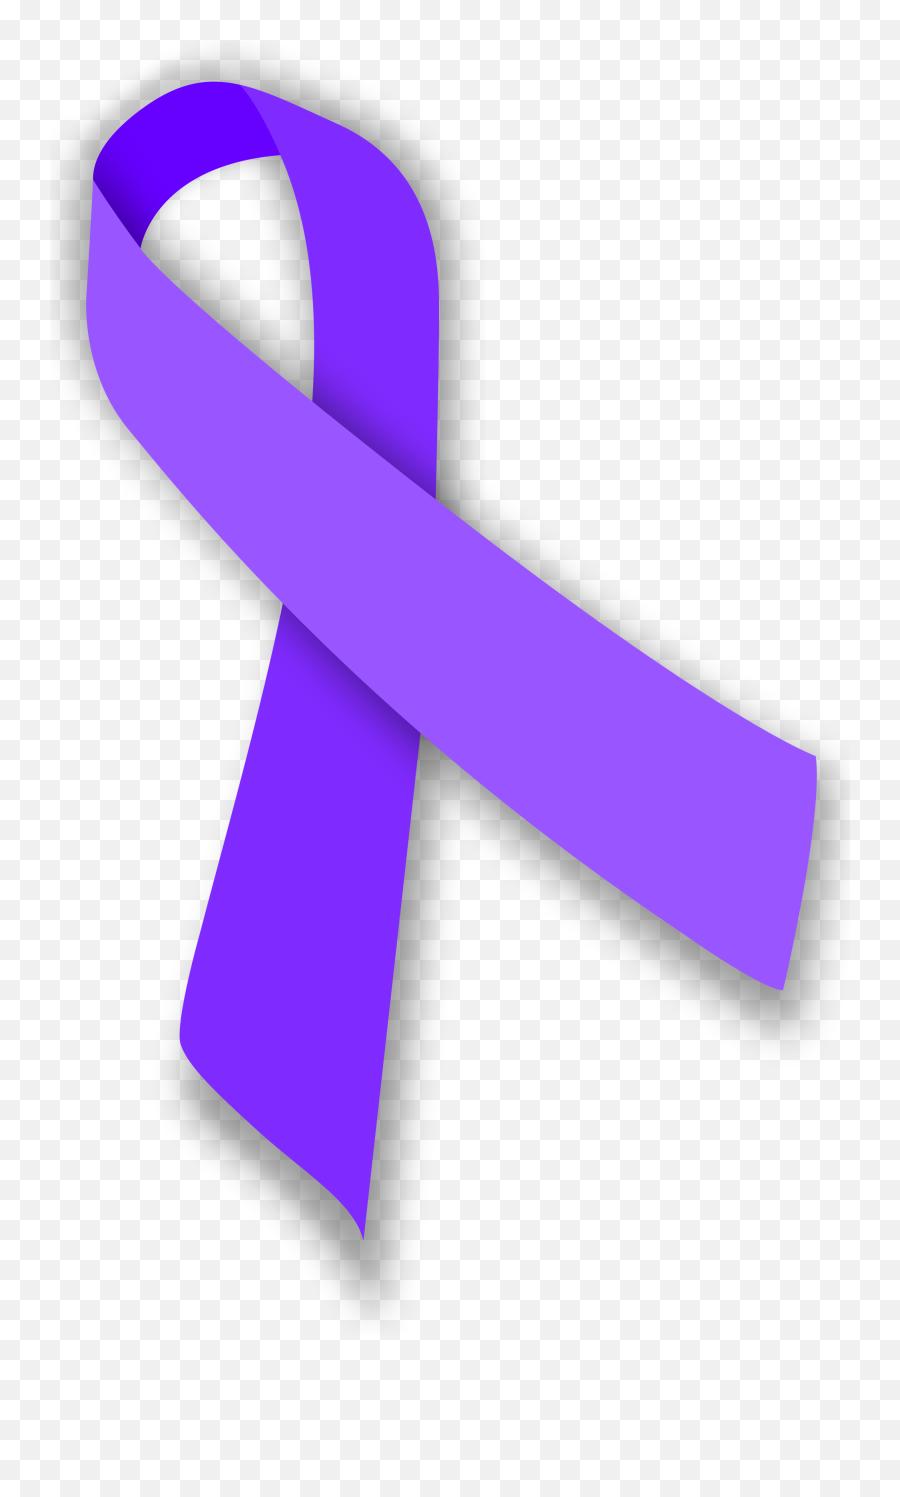 Download Hd Lavender Ribbon Png Picture - Lymphoma Cancer Ribbon,Purple Ribbon Png